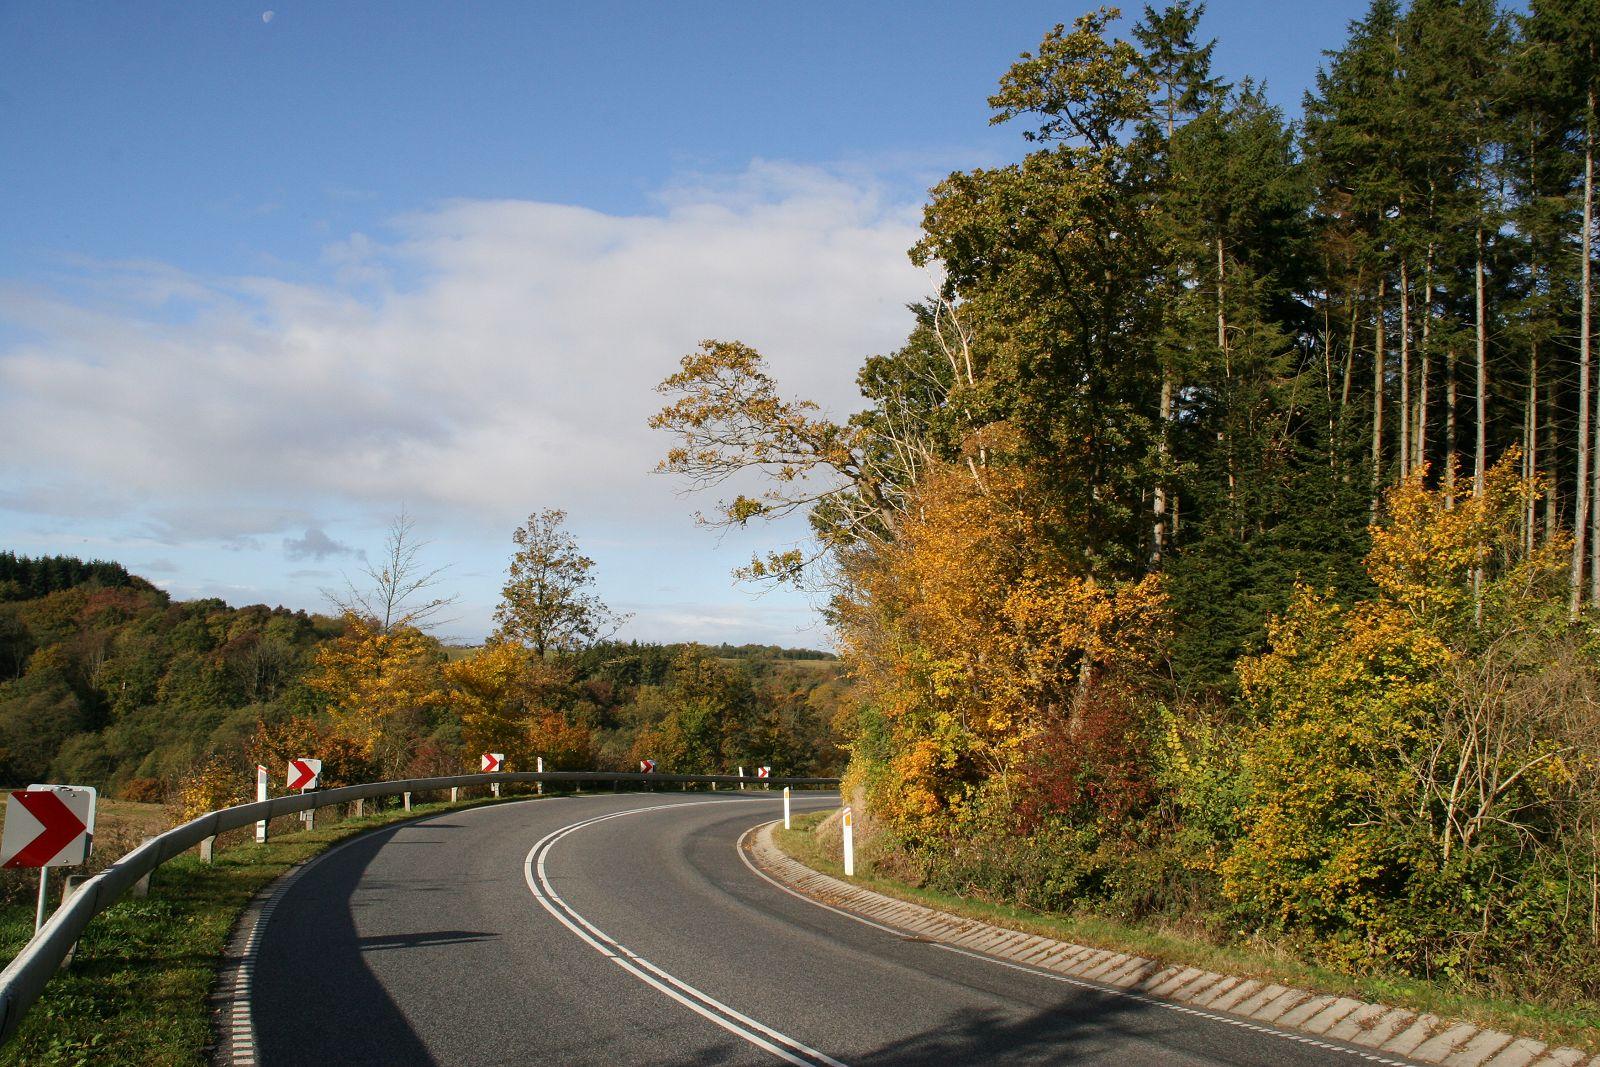 Driving in Denmark